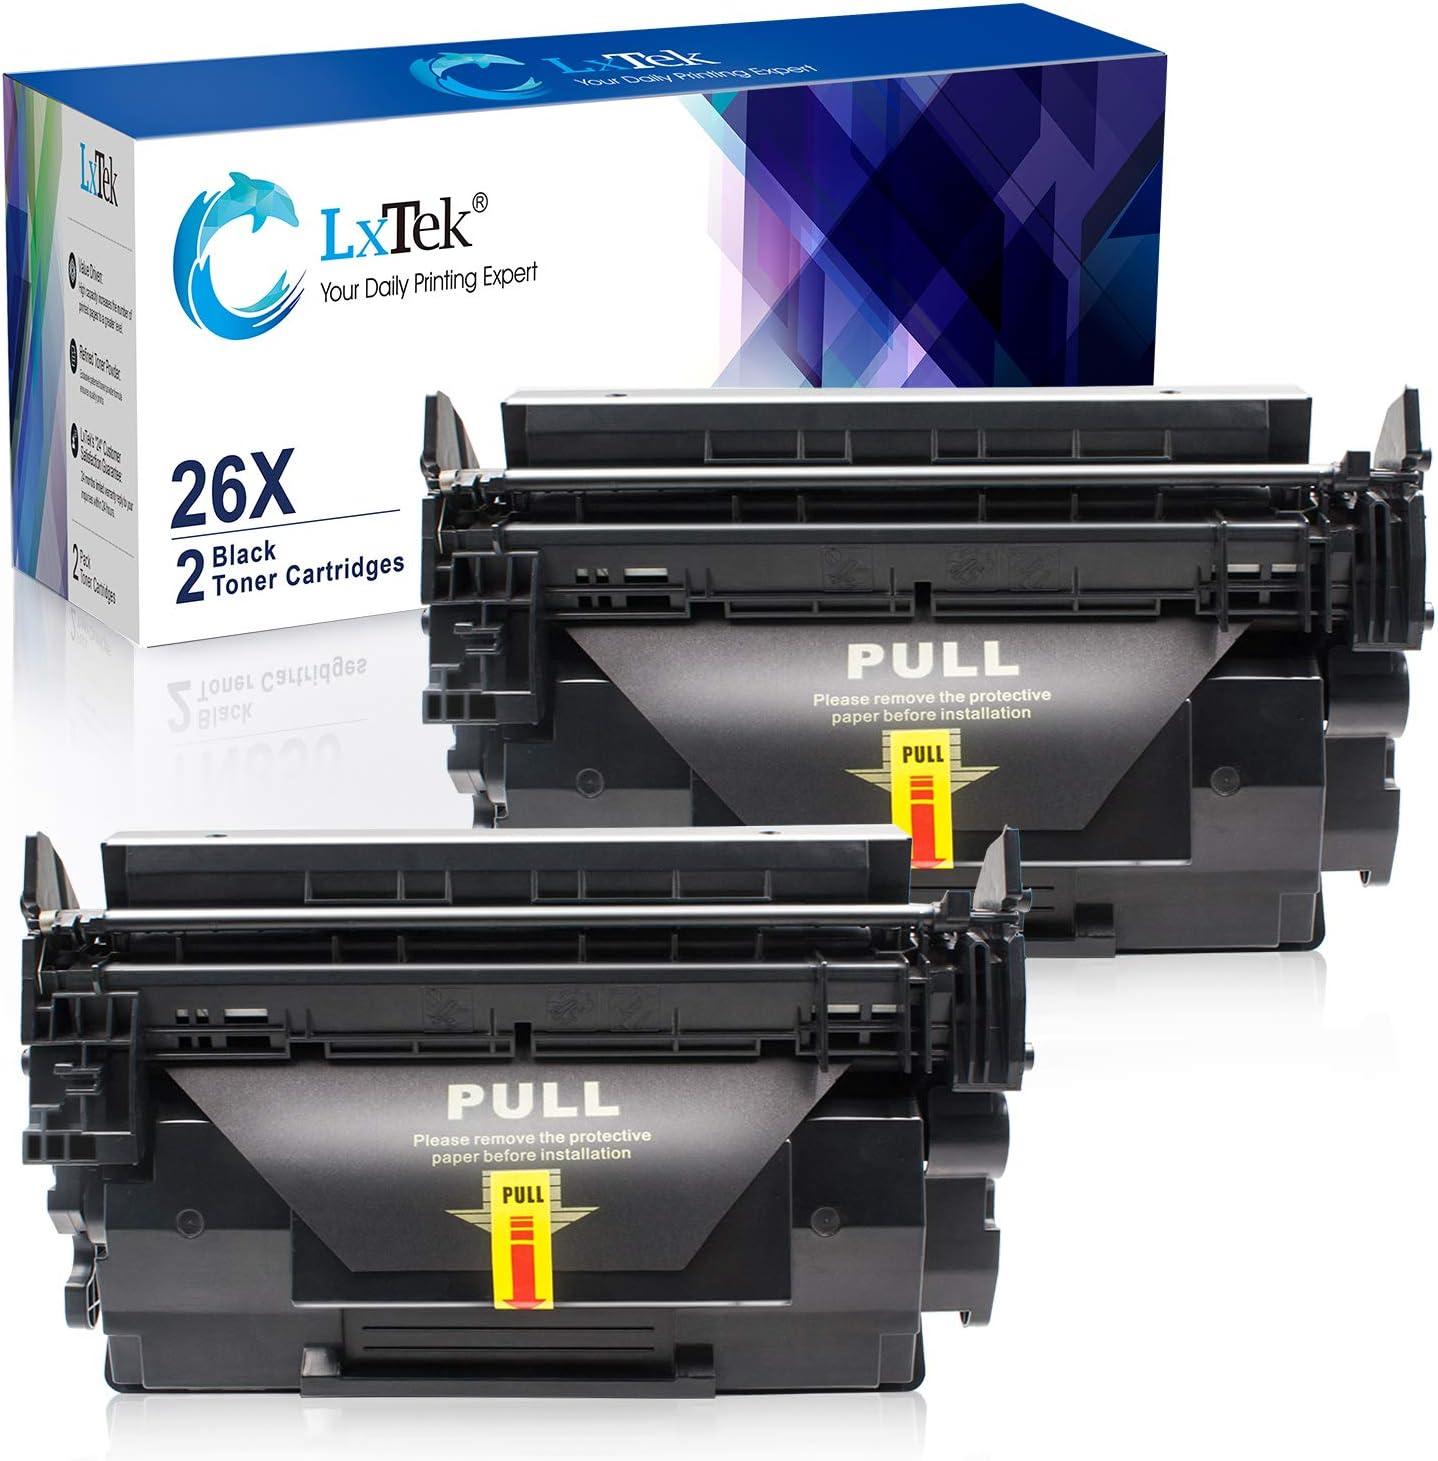 LxTeK Compatible Toner Cartridge Replacement for HP 26A CF226A 26X to use with LaserJet Pro M402dn M402n M402dw, MFP M426fdw M426fdn, M402dne M426dw Printer (2 Black)